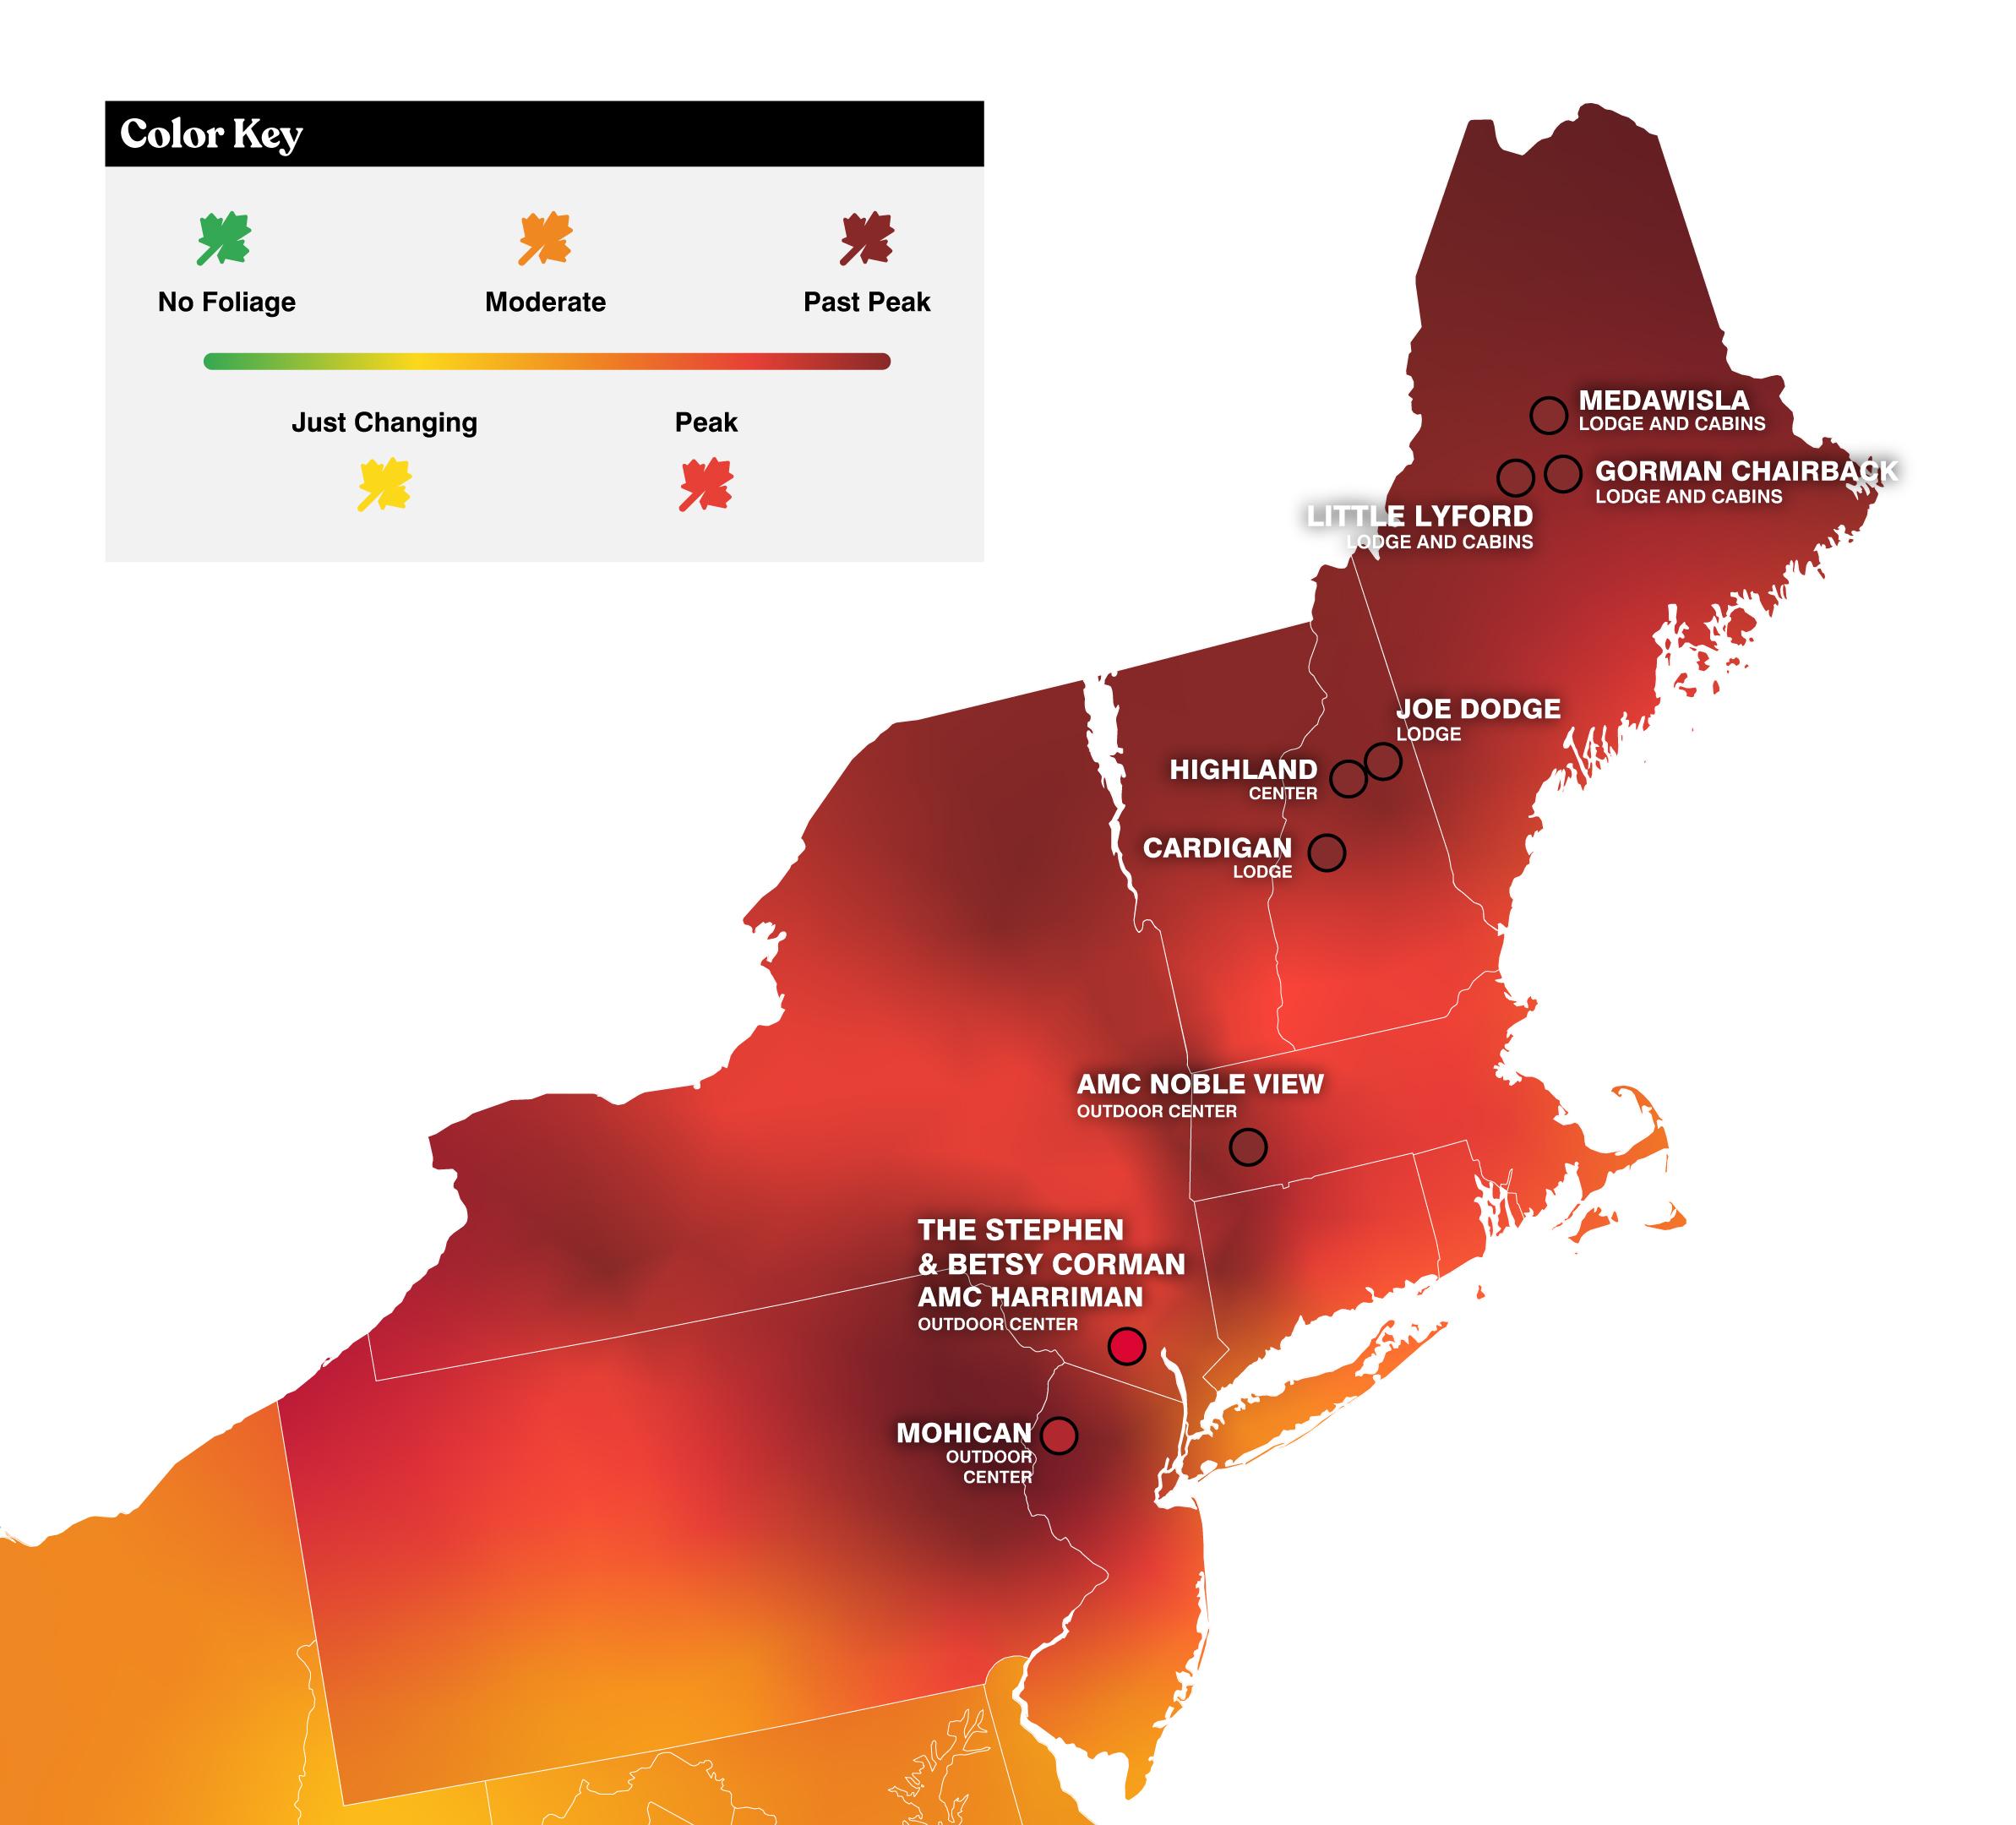 foliage prediction map